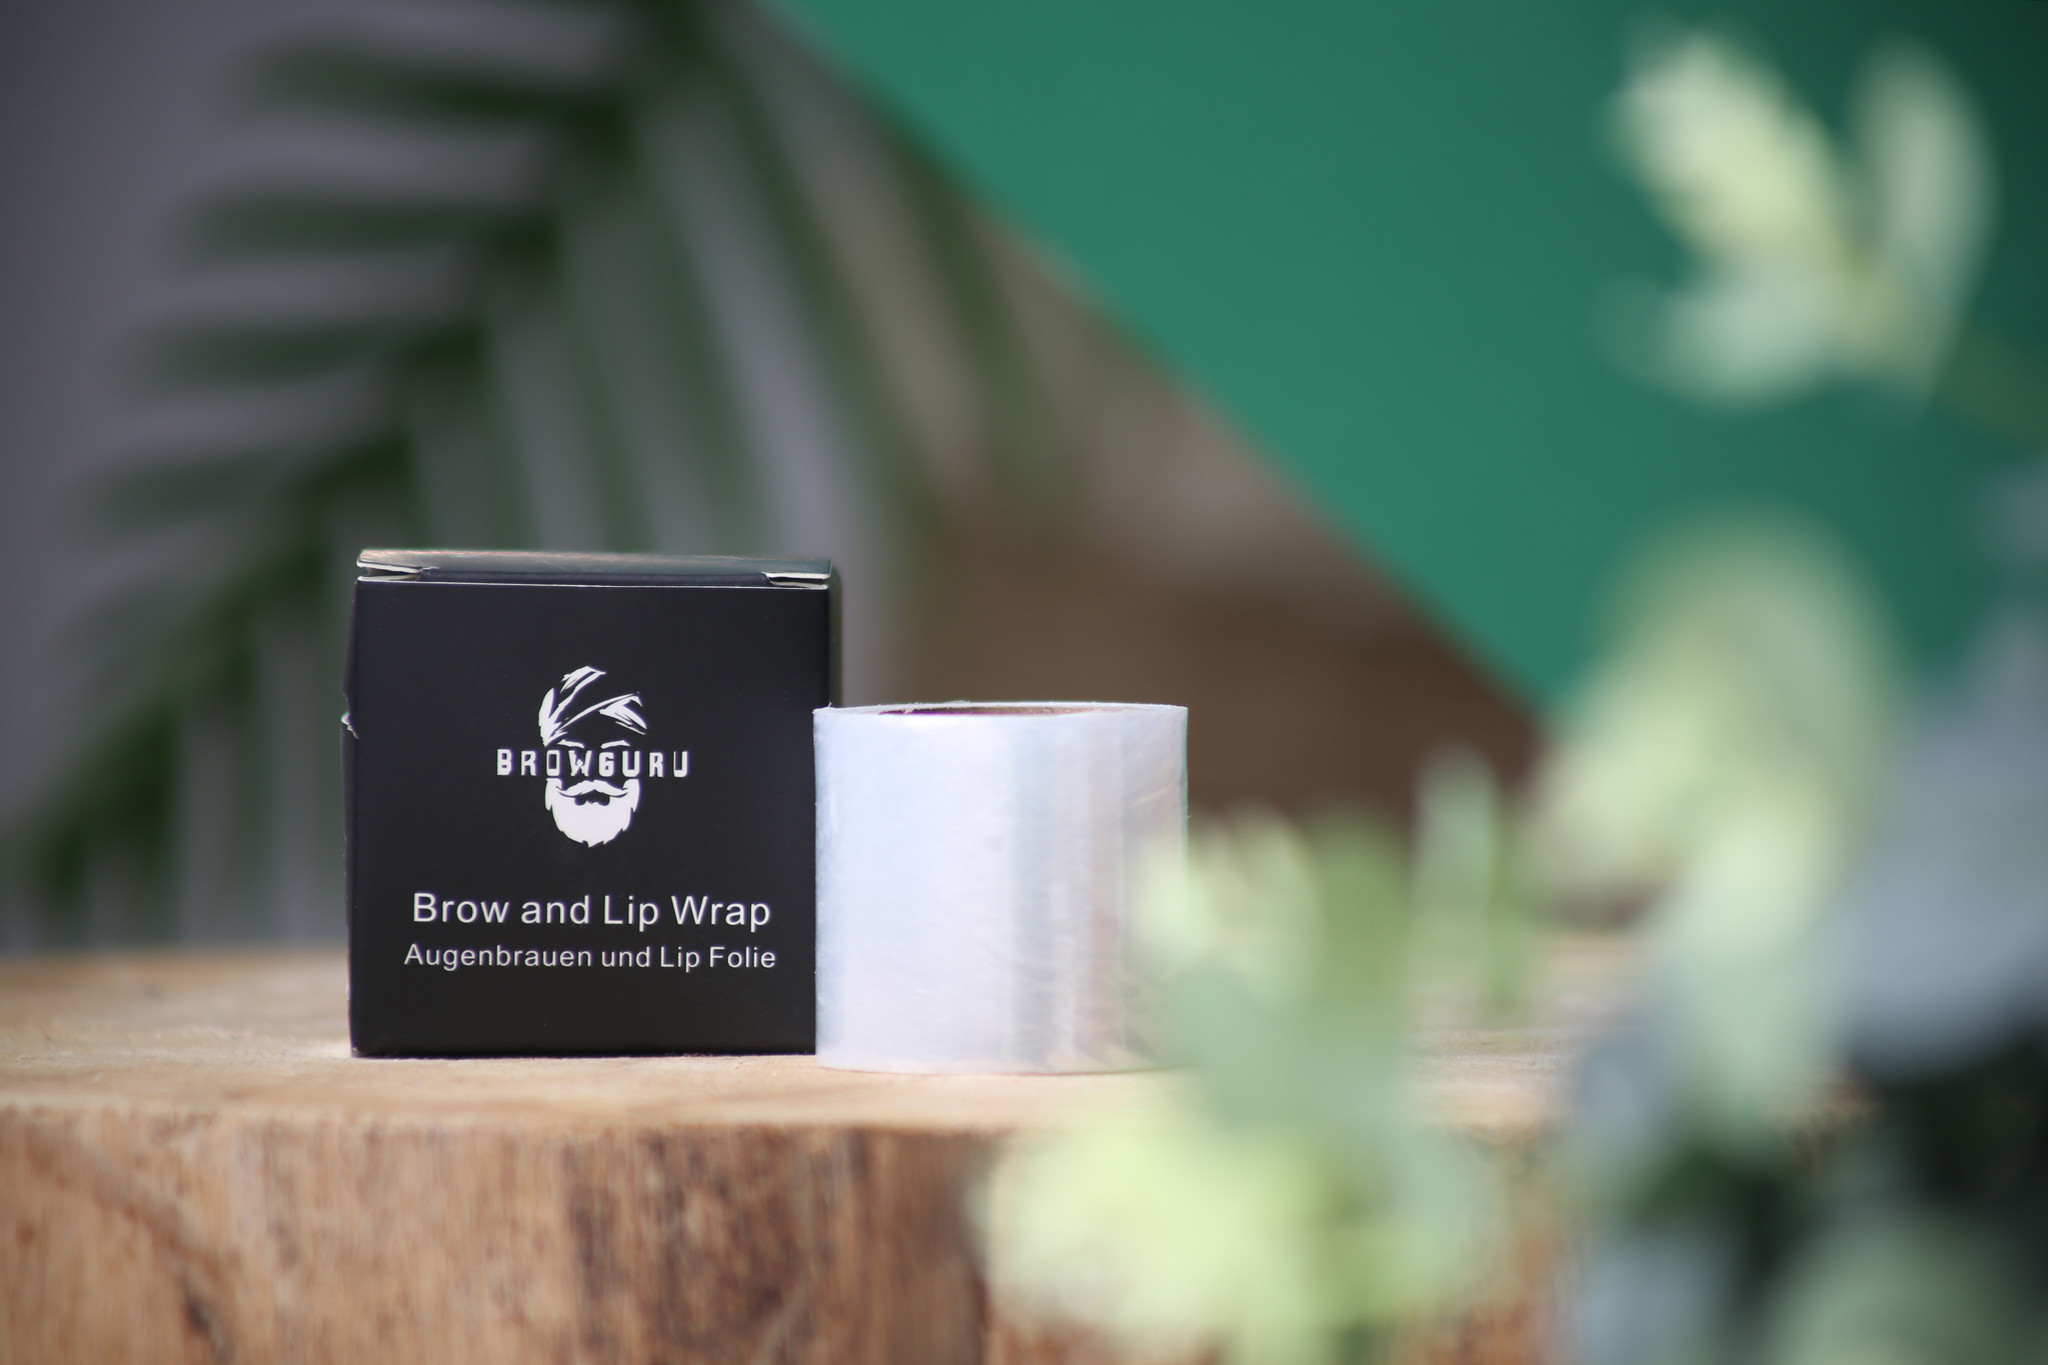 Browlift Brow & Lip Wrap